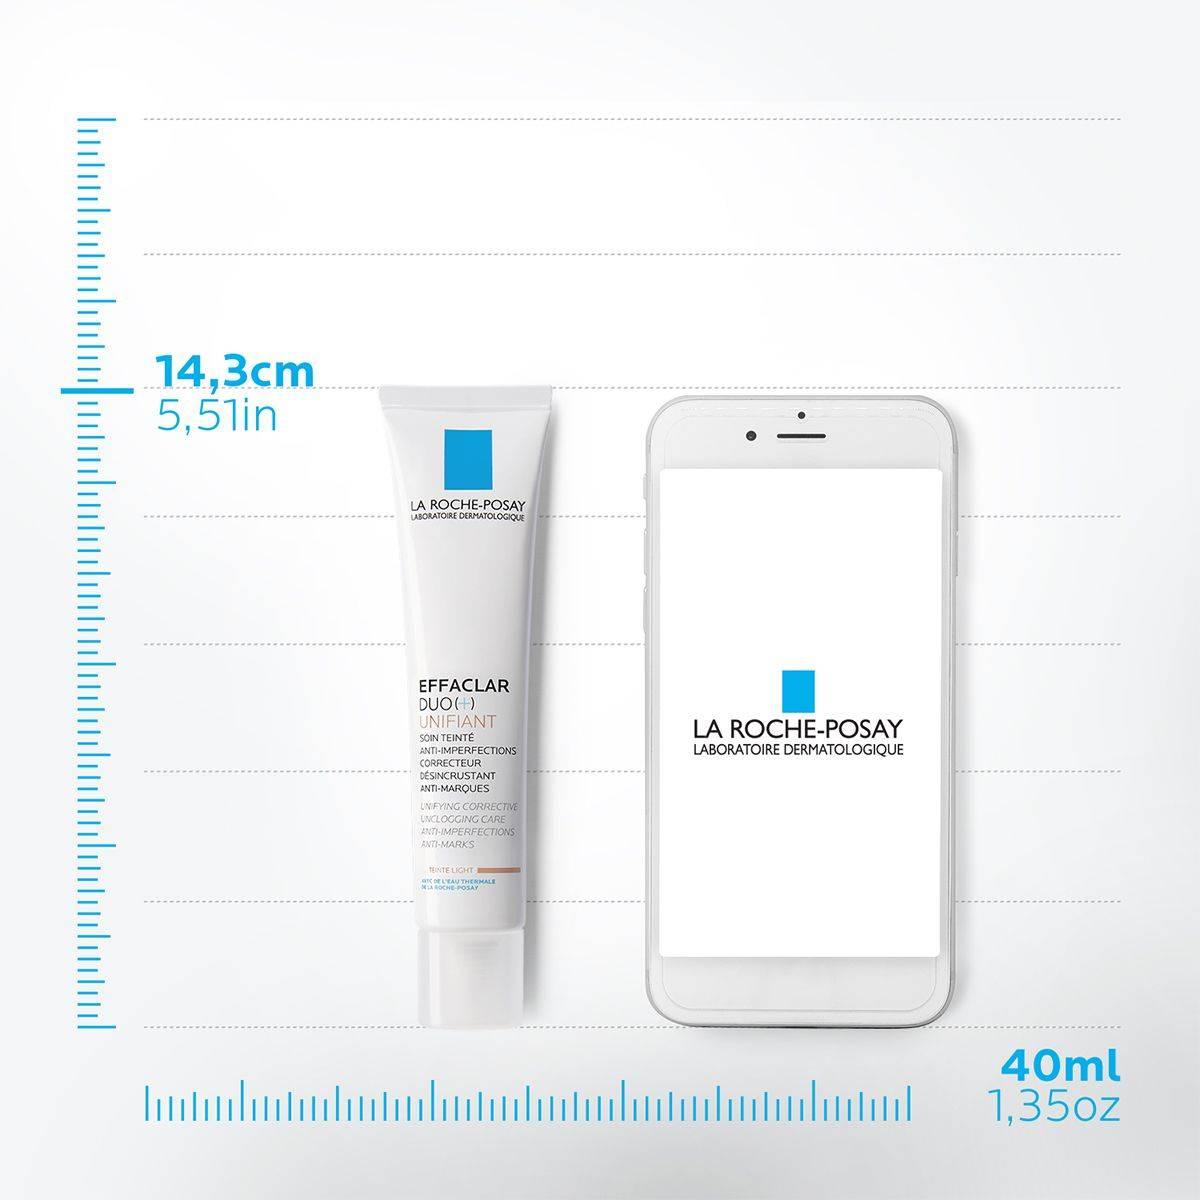 La Roche Posay Face Care Effaclar Duo plus Unifiant Light 40ml 3337875